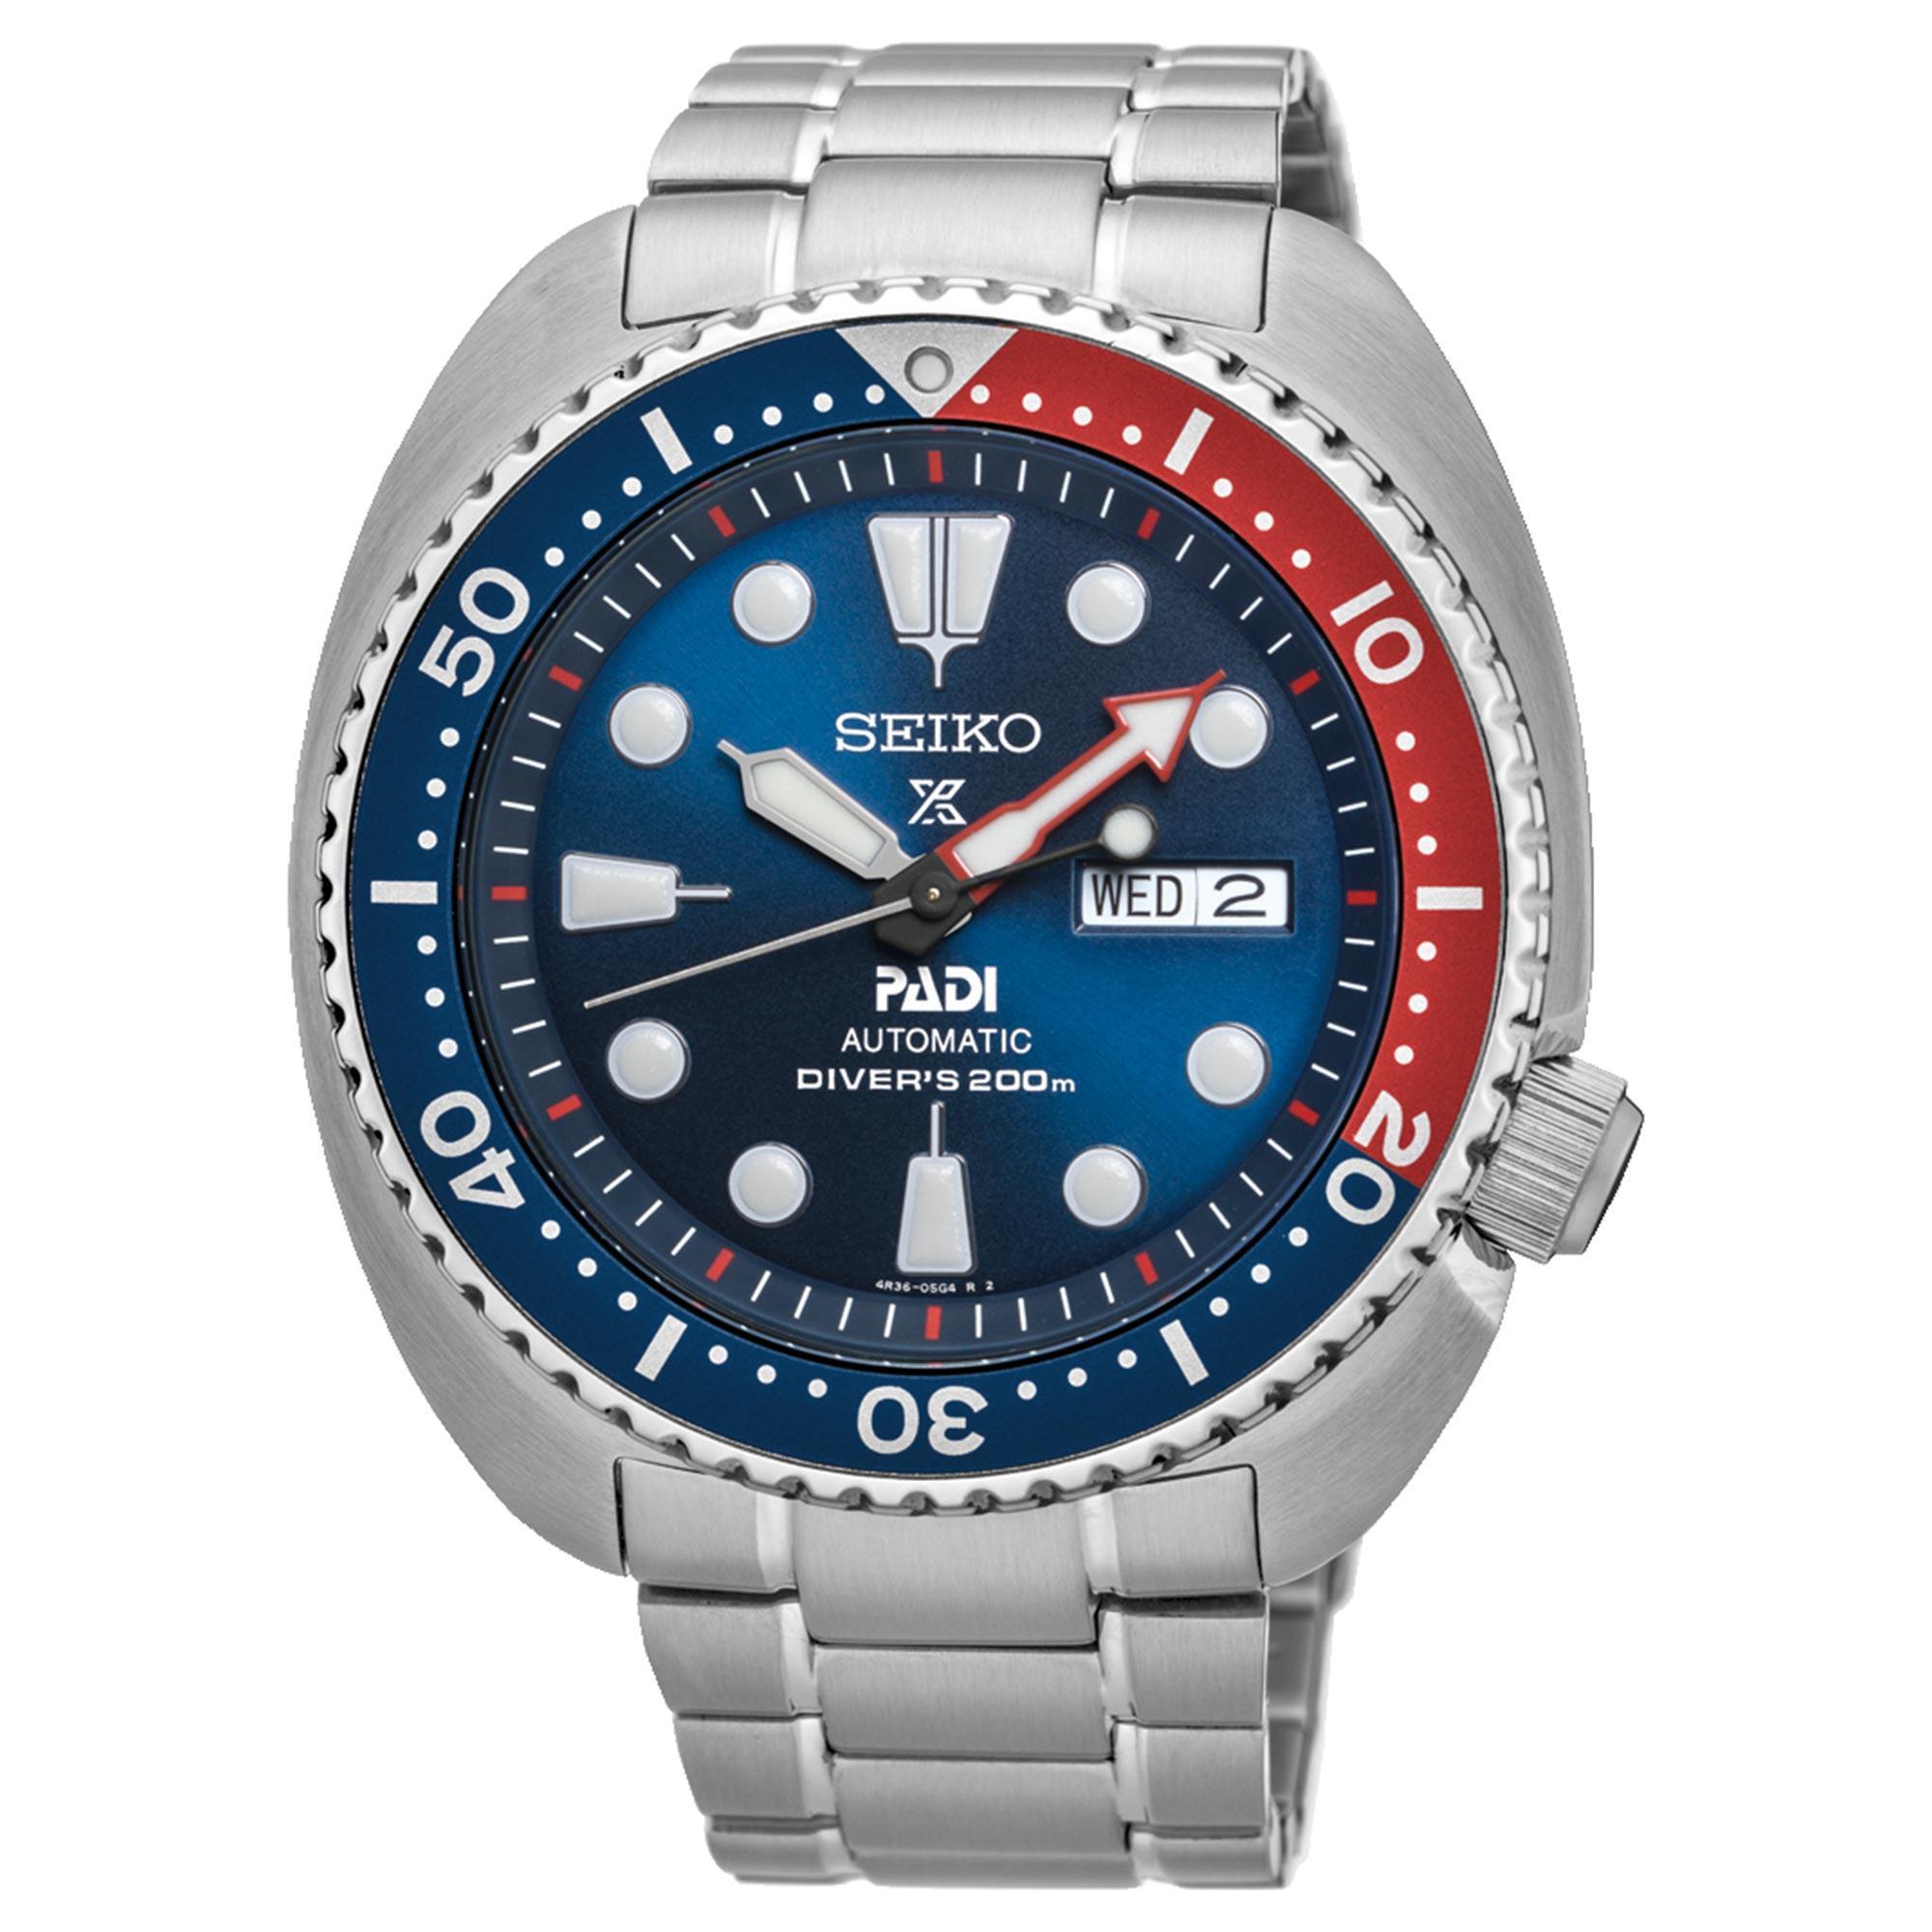 Seiko Prospex Special Edition 'Pepsi Bezel' Turtle PADI Divers Mens Watch SRPA21K1 45mm